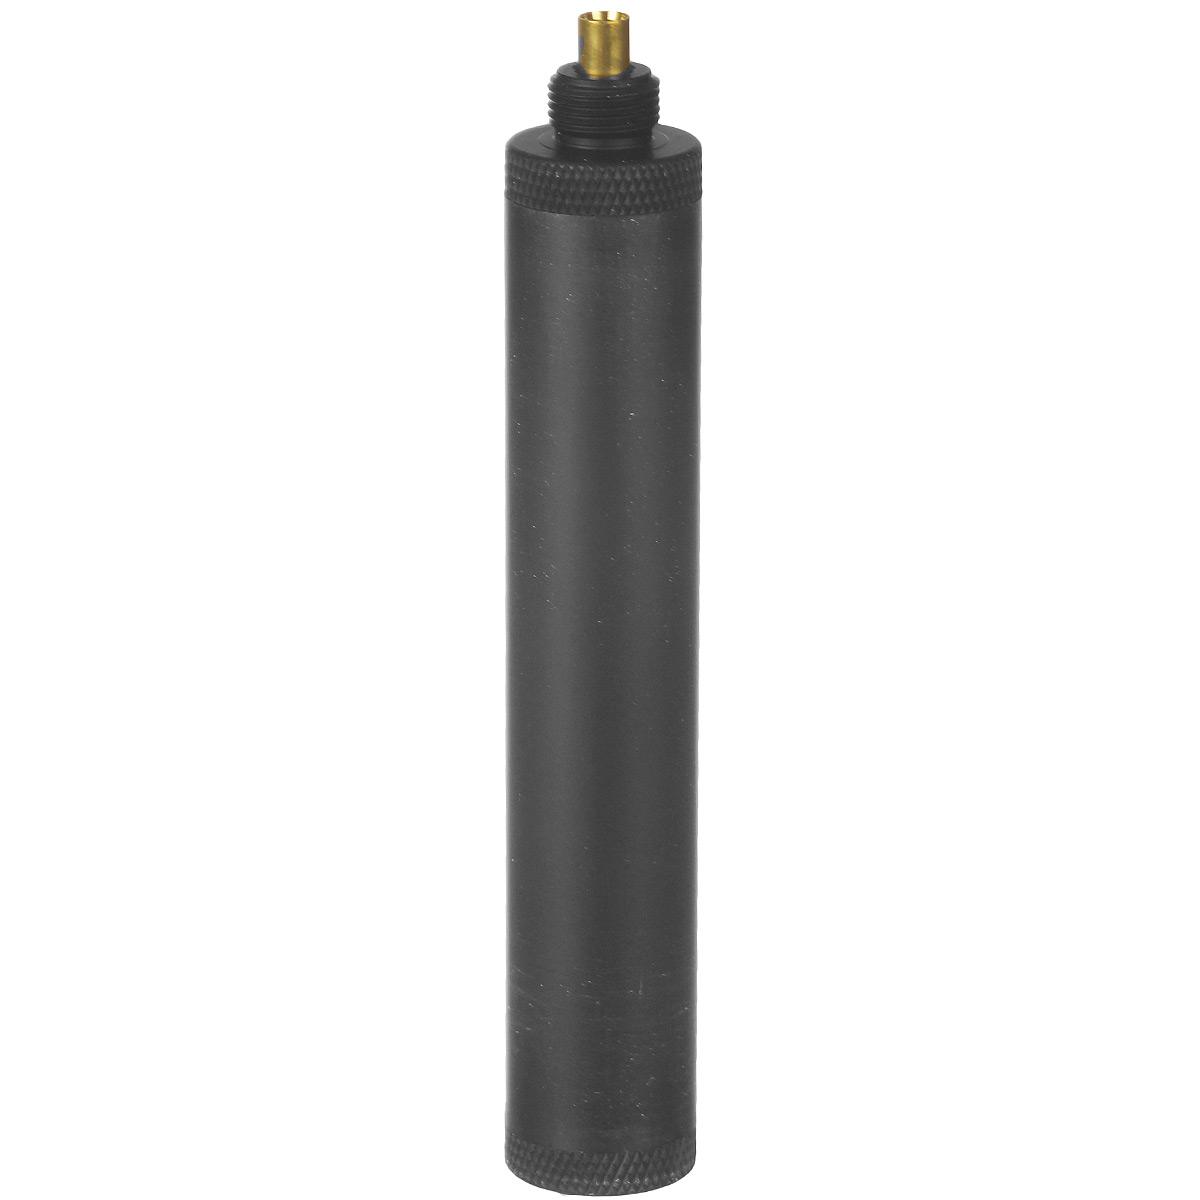 ASG имитация глушителя-удлинитель ствола CZ75D, CZ 75 P-07, STI (17644)